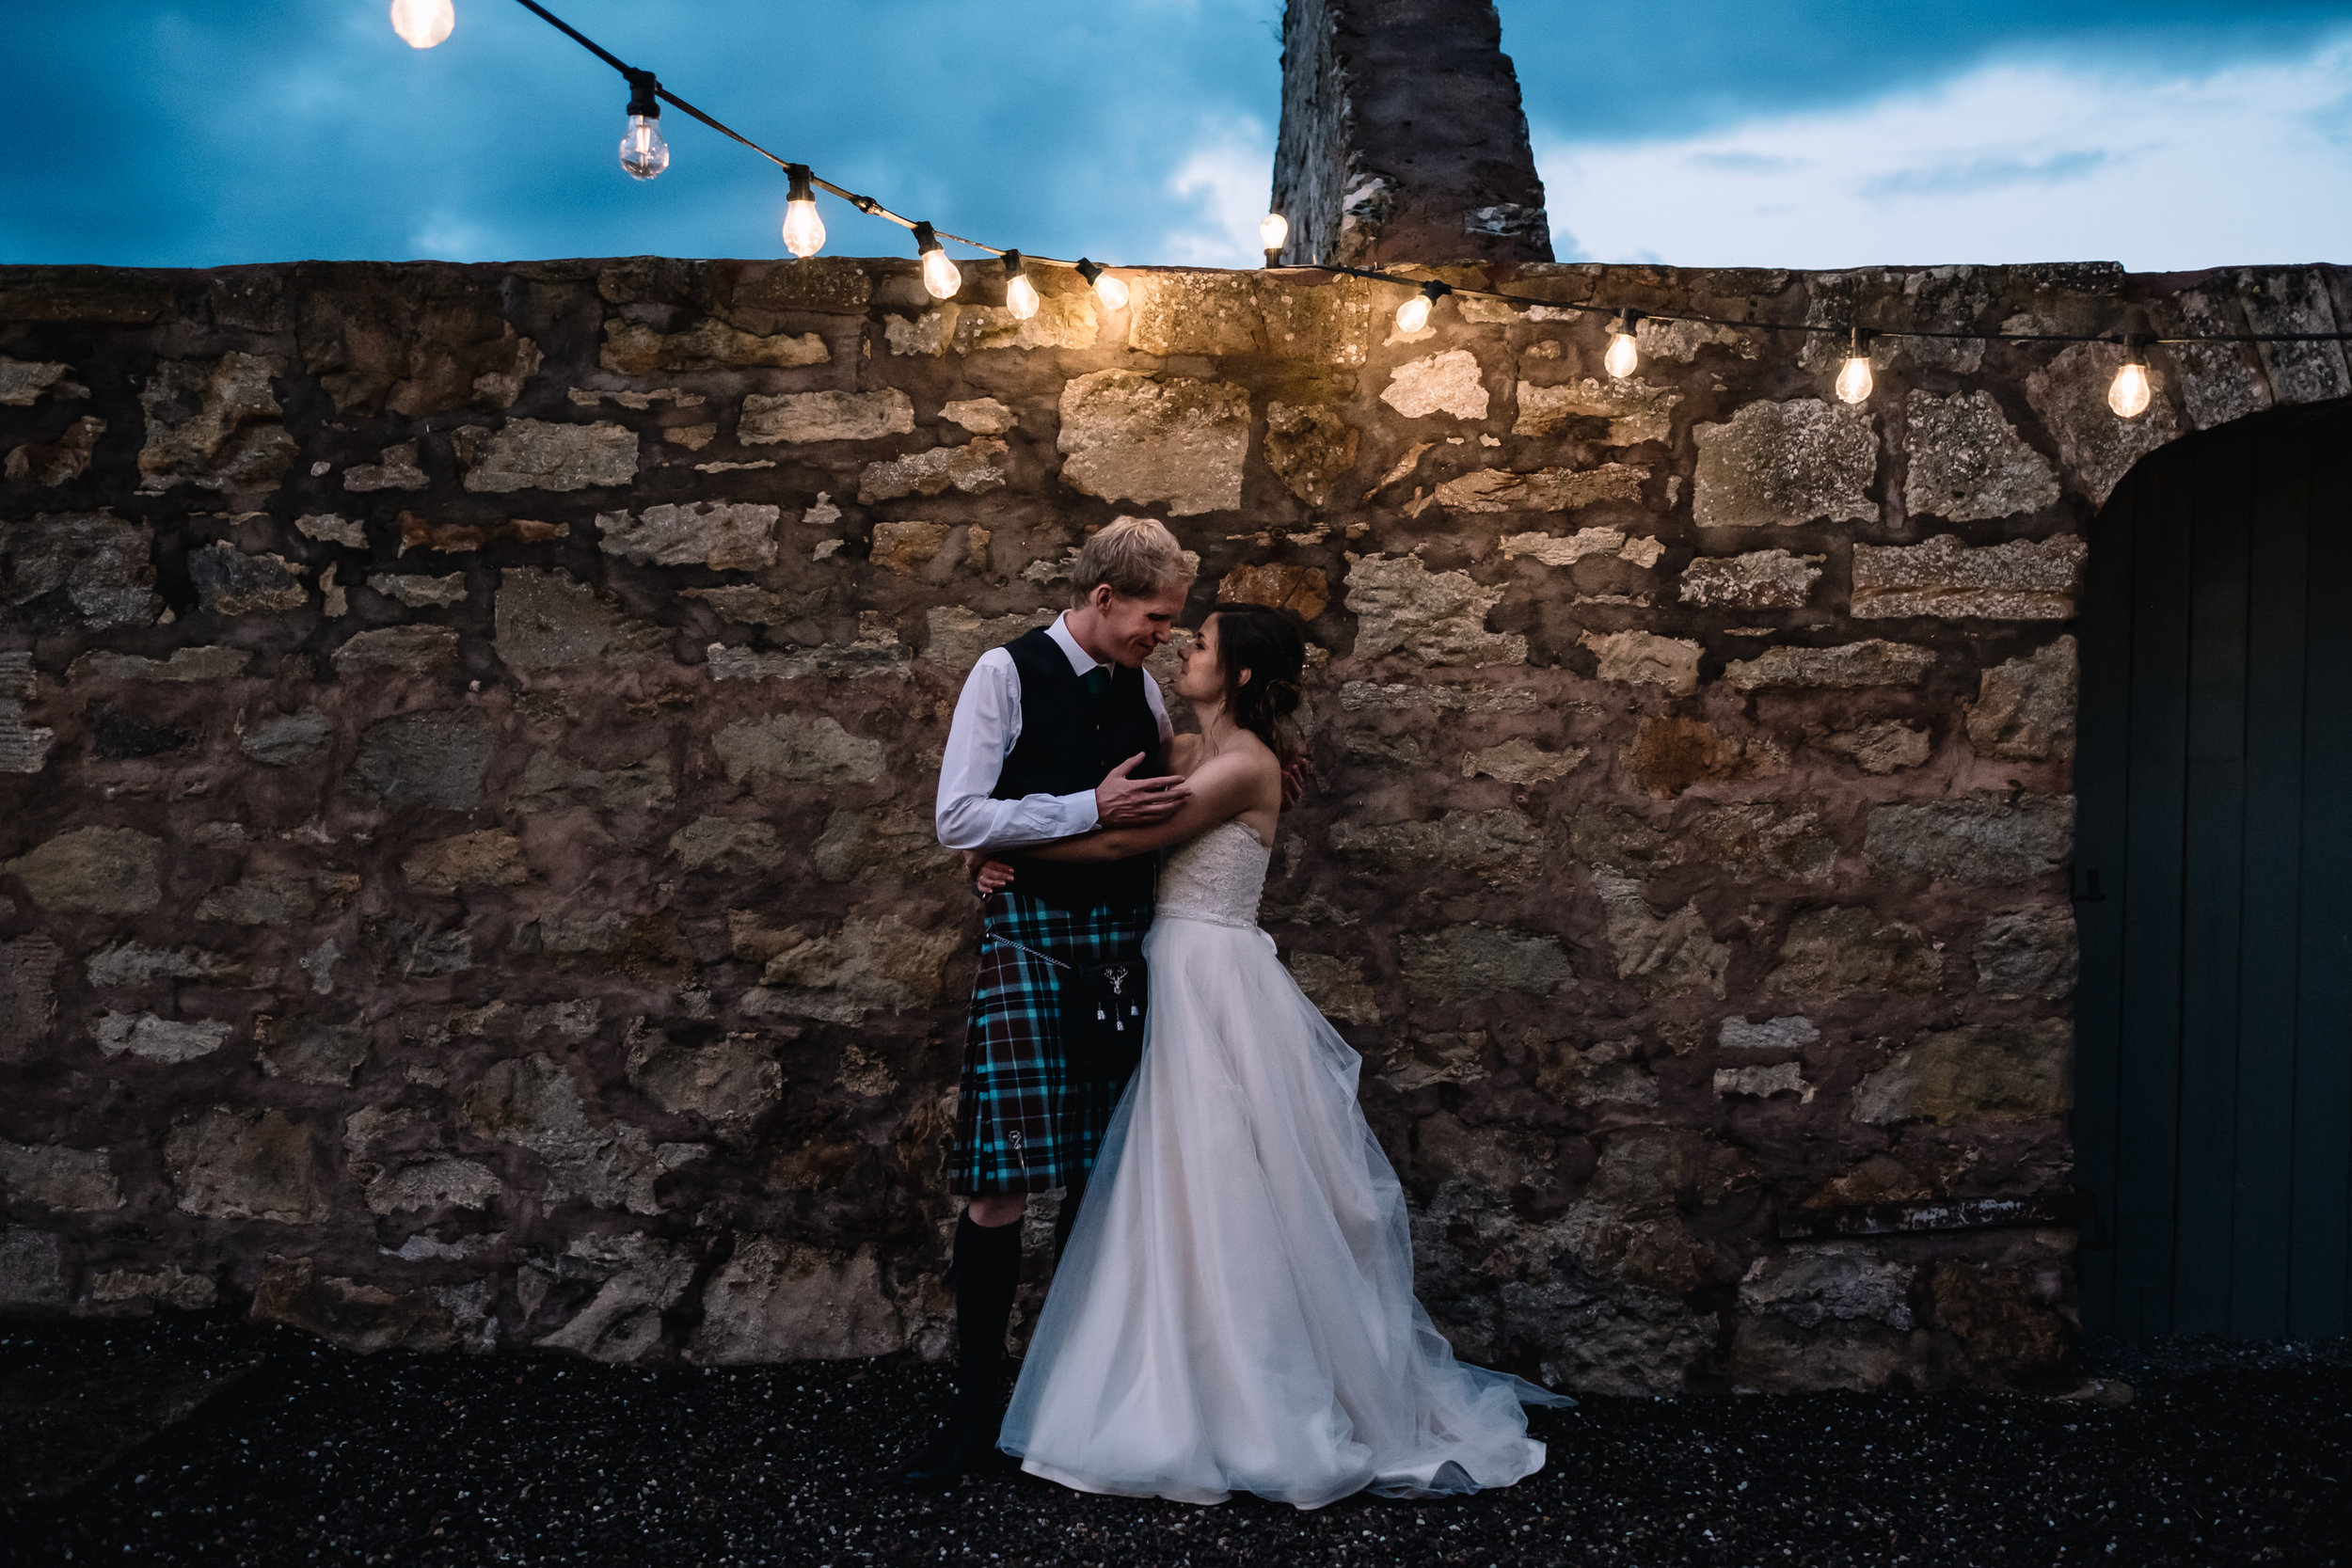 Bride + groom embrace